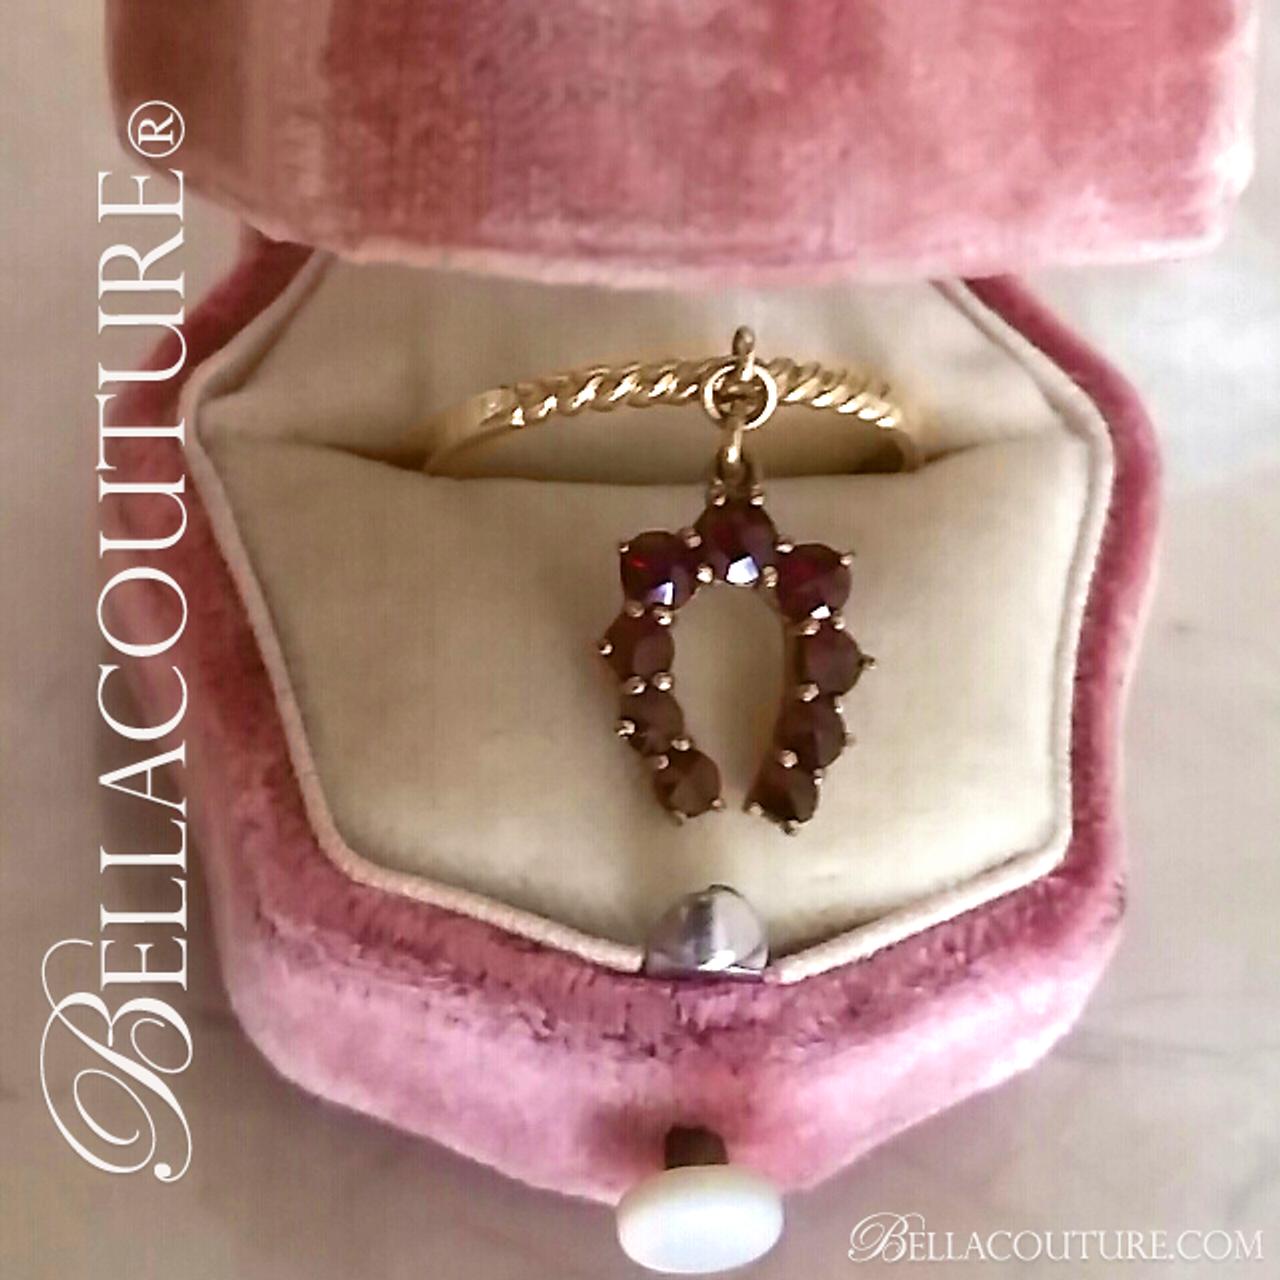 318d7f0b16b9a SOLD! - (ANTIQUE) Rare Gorgeous Victorian 14K 14CT Yellow Gold Natural Rose  Cut Garnet Gemstone Dainty Horseshoe Good Luck Dangle Drop Charm Ring c. ...